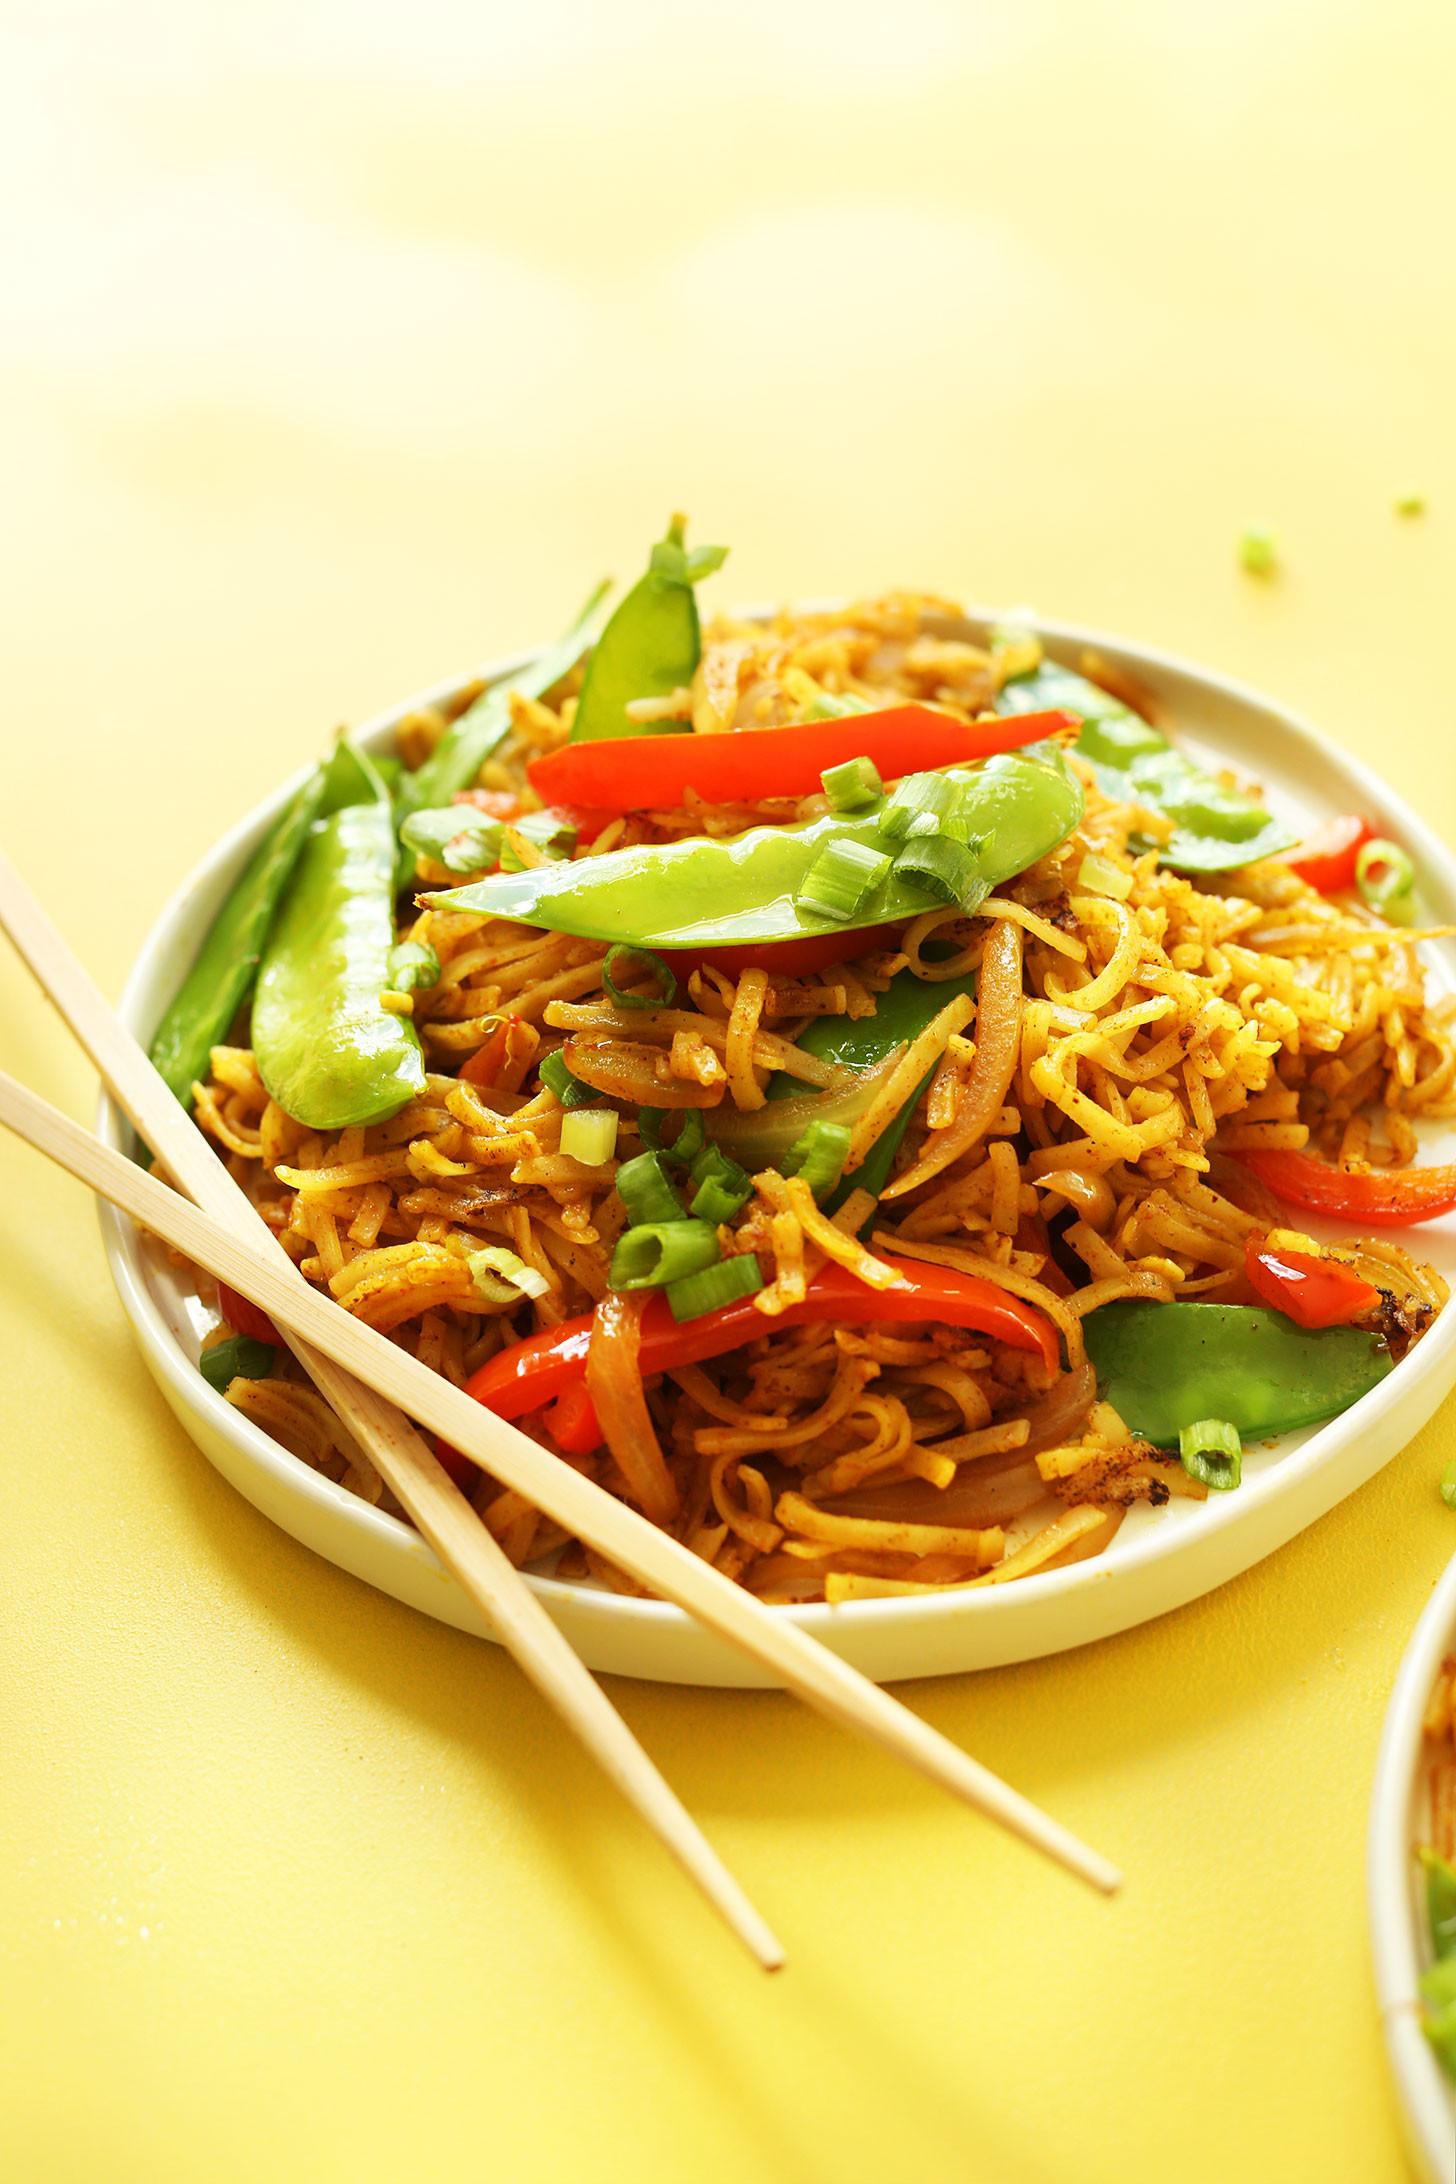 Are Noodles Healthy  EASY Vegan Singapore Noodles 10 ingre nts simple